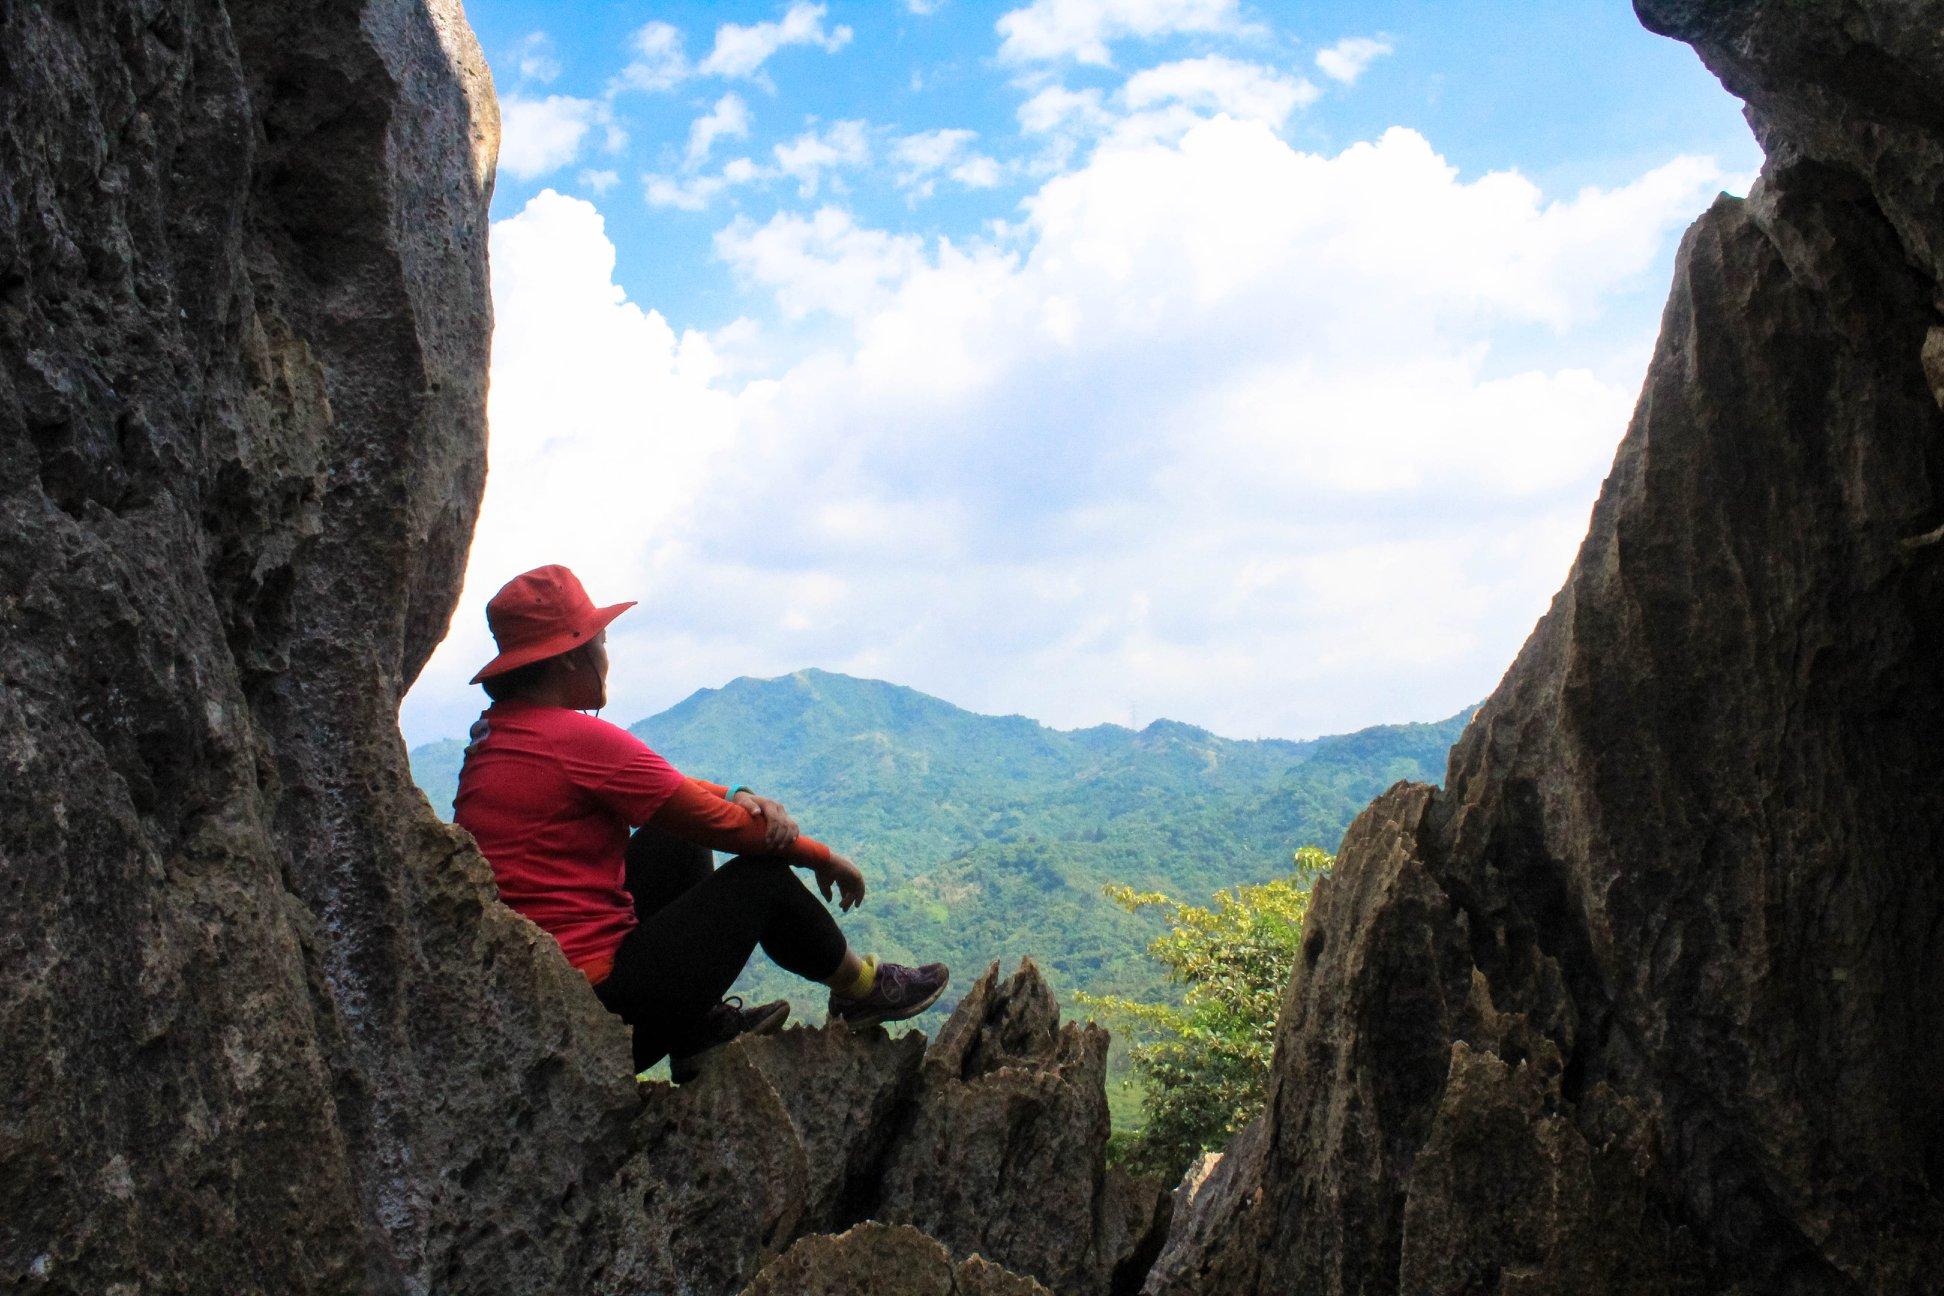 Hiking Experience in Rizal